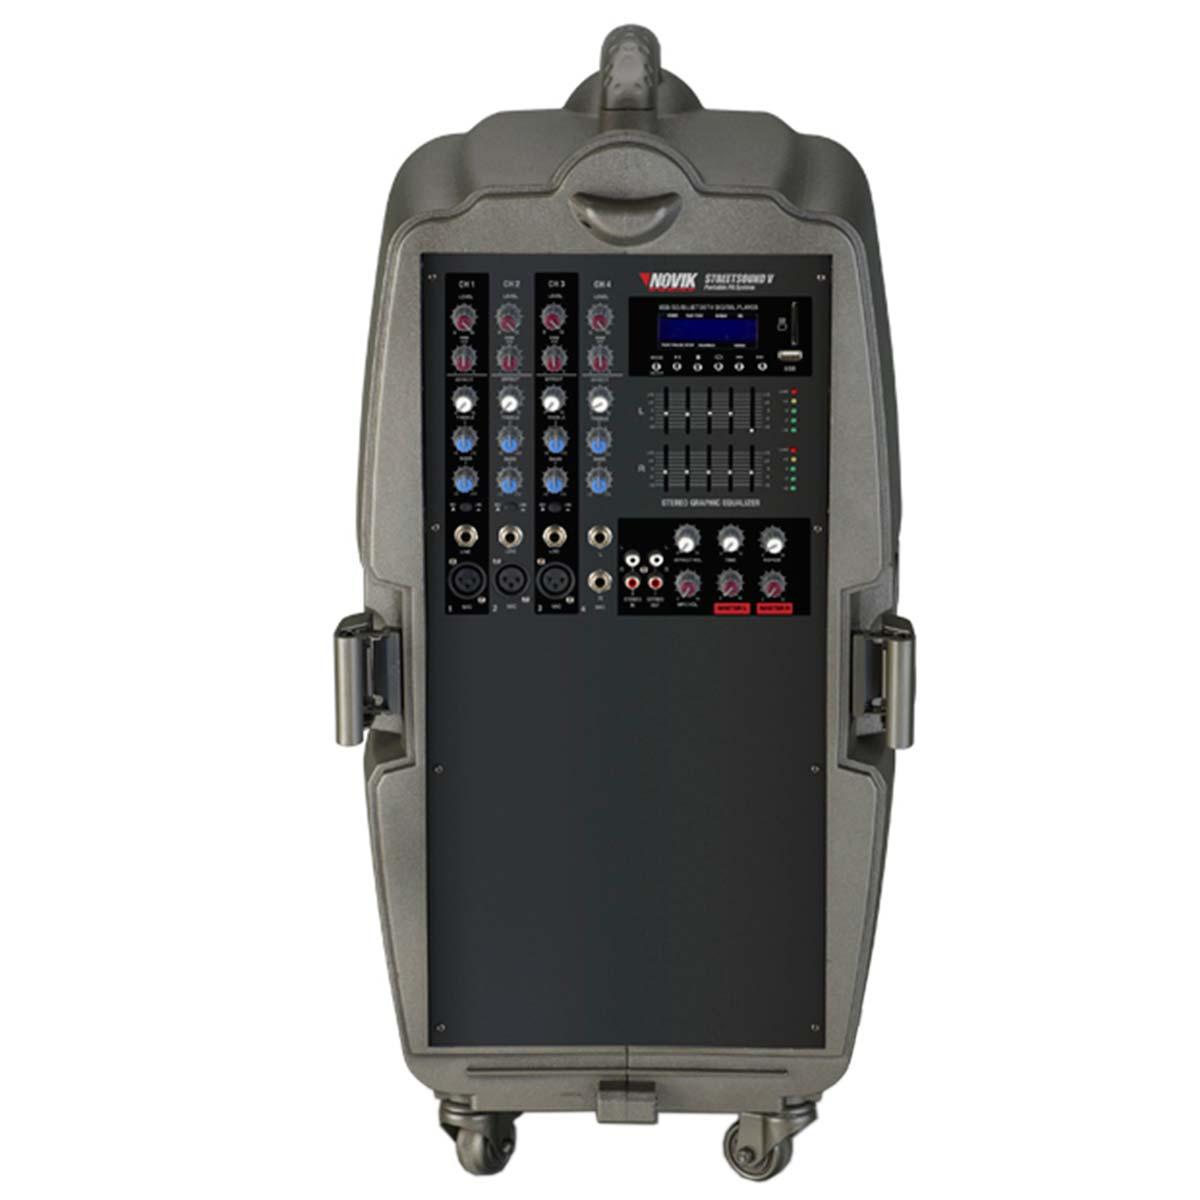 StreetSoundV - Kit Portátil c/ Mixer e 2 Caixas Street Sound V - Novik Neo